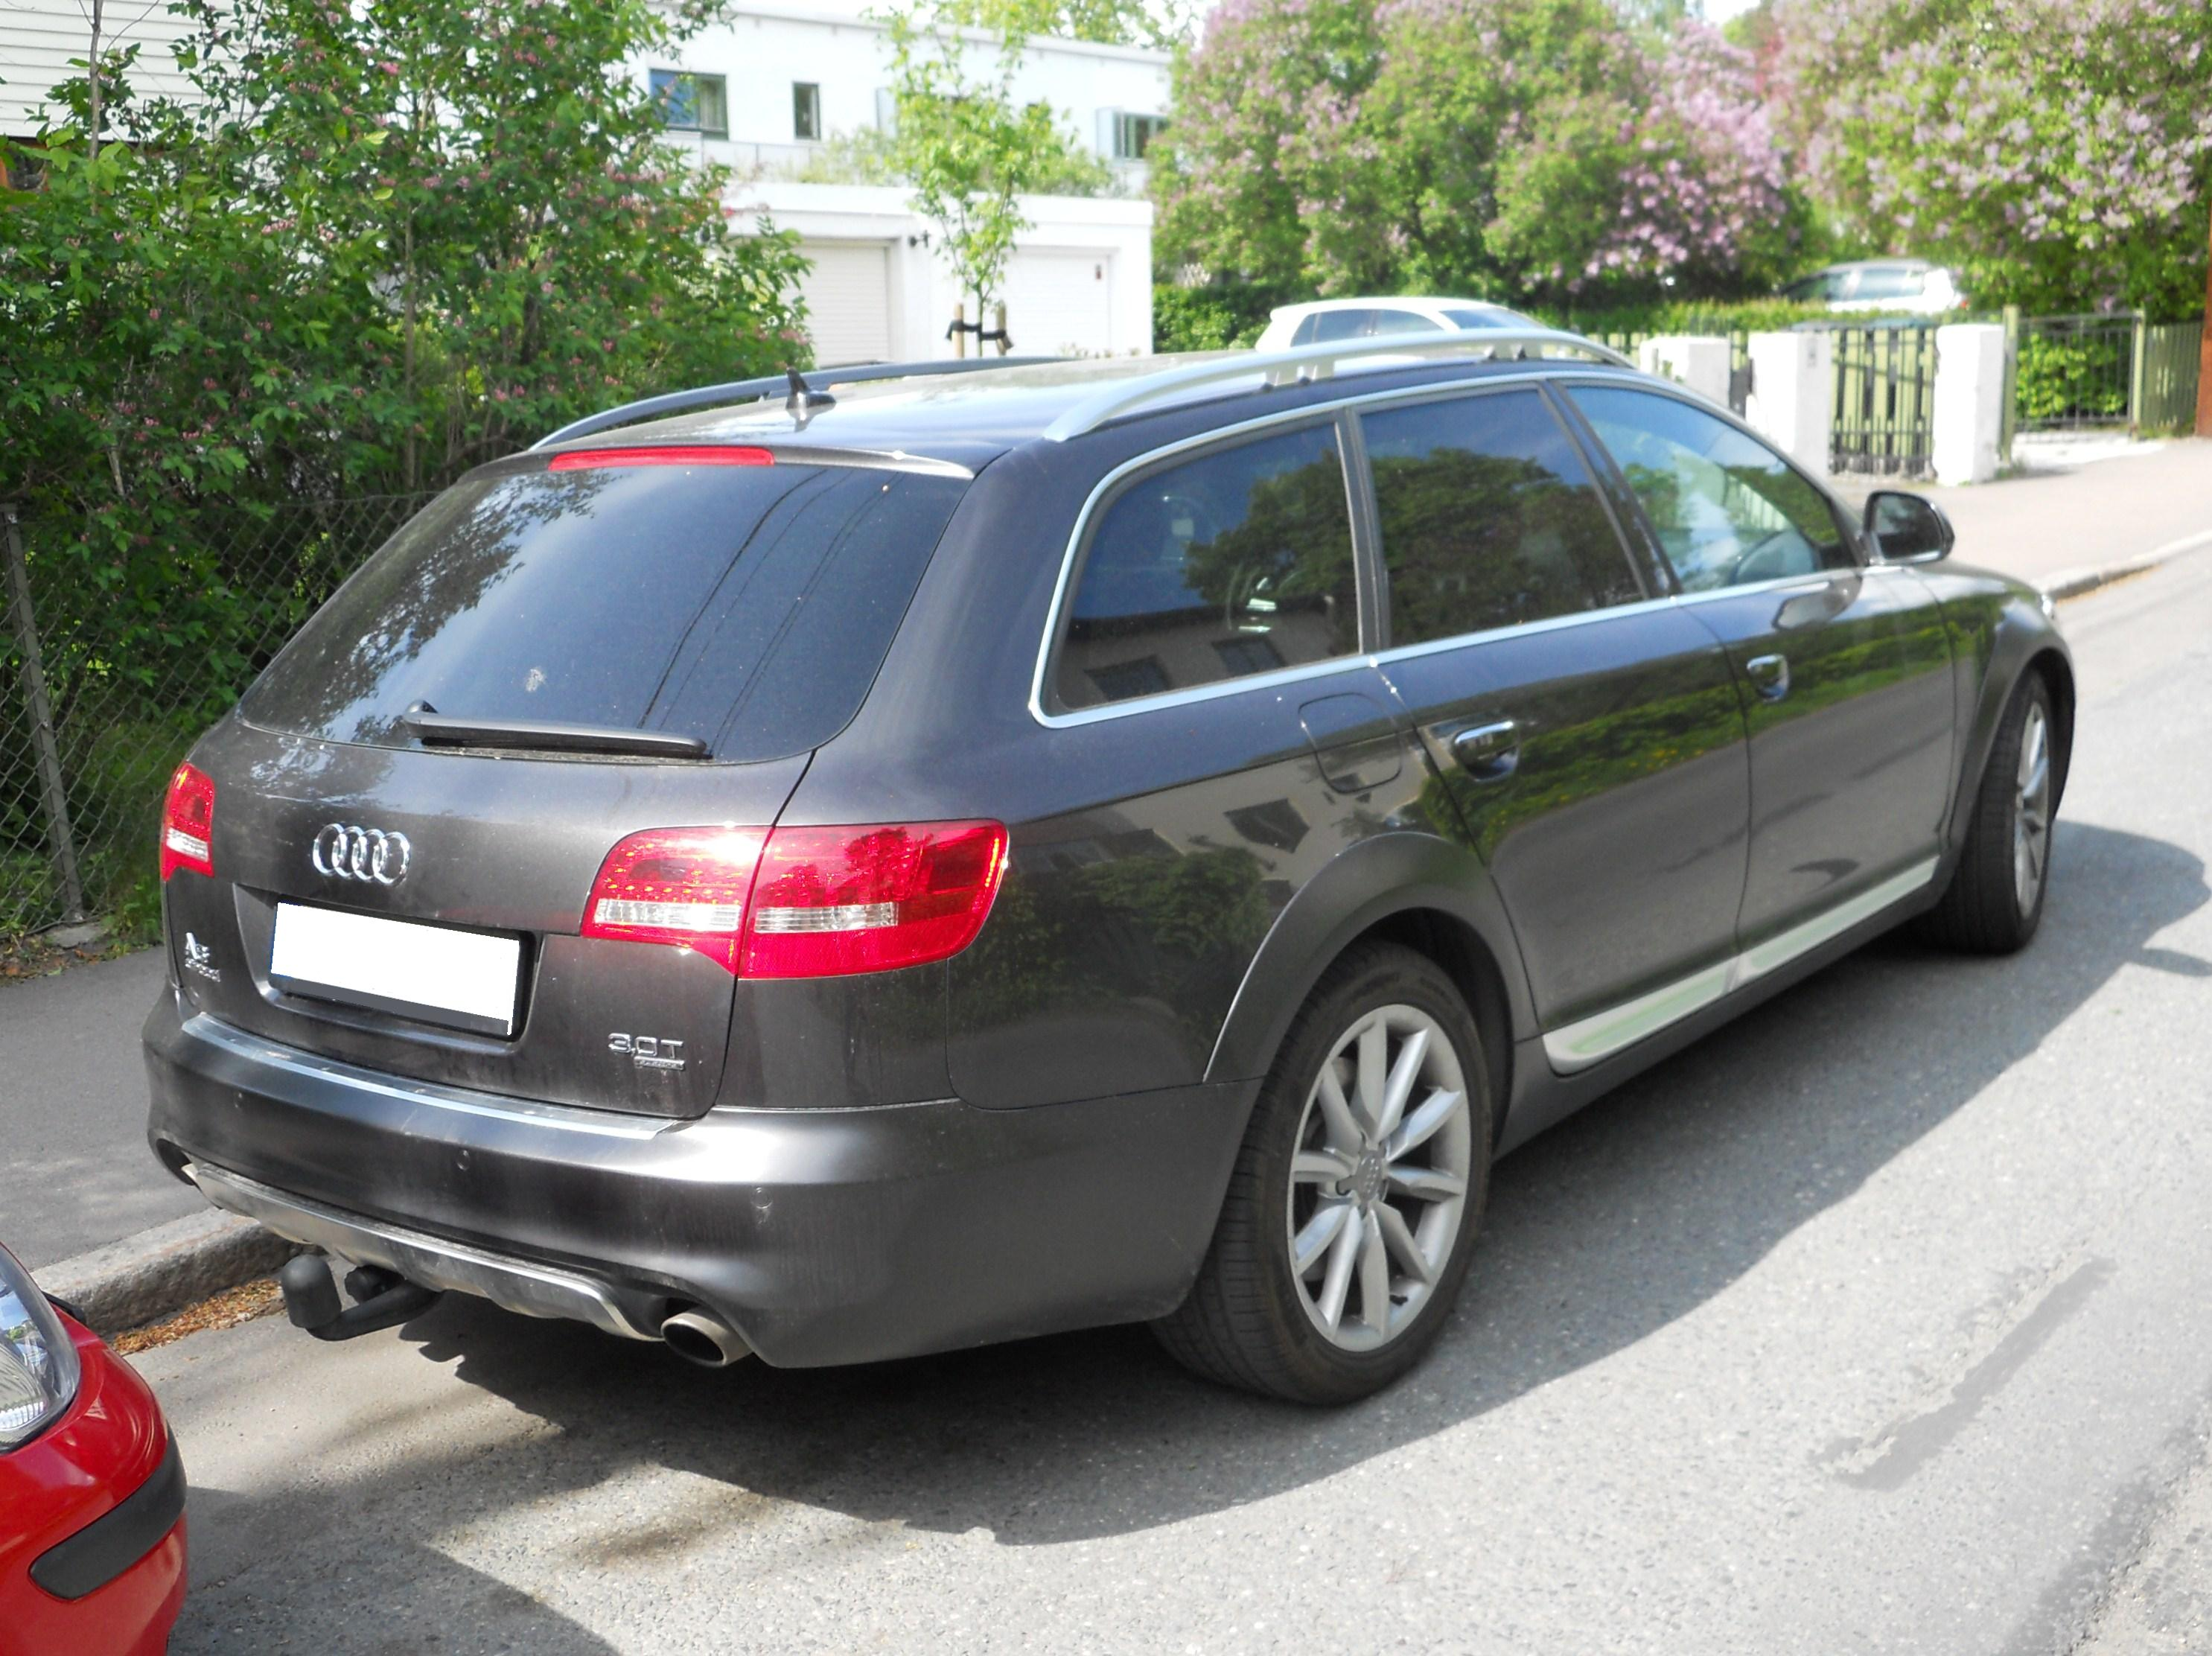 Audi A6 3.0T >> File:Audi A6 Allroad 3.0T Quattro.jpg - Wikimedia Commons